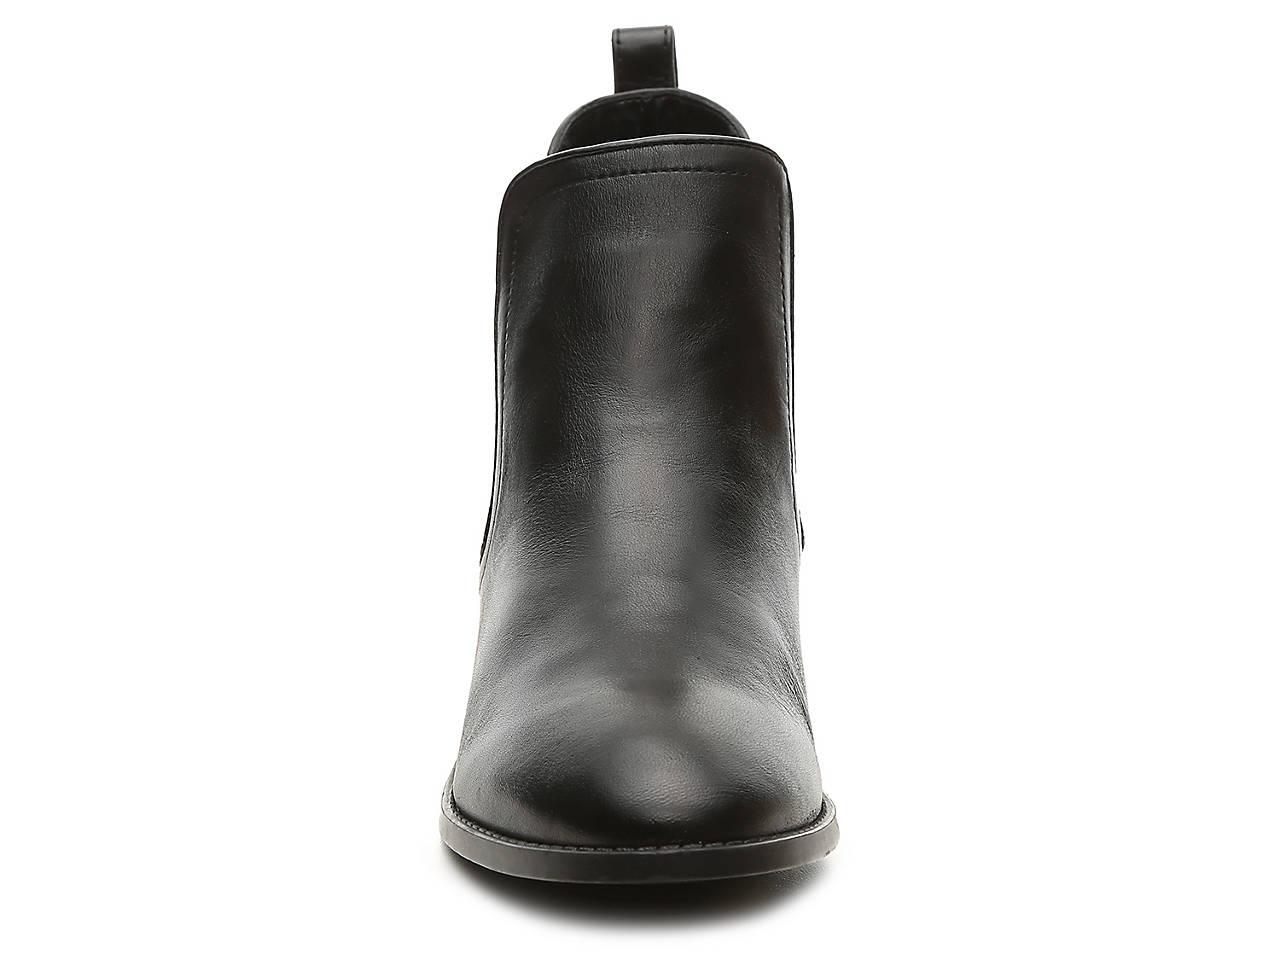 8b63b3d12c2 Dicey Chelsea Boot